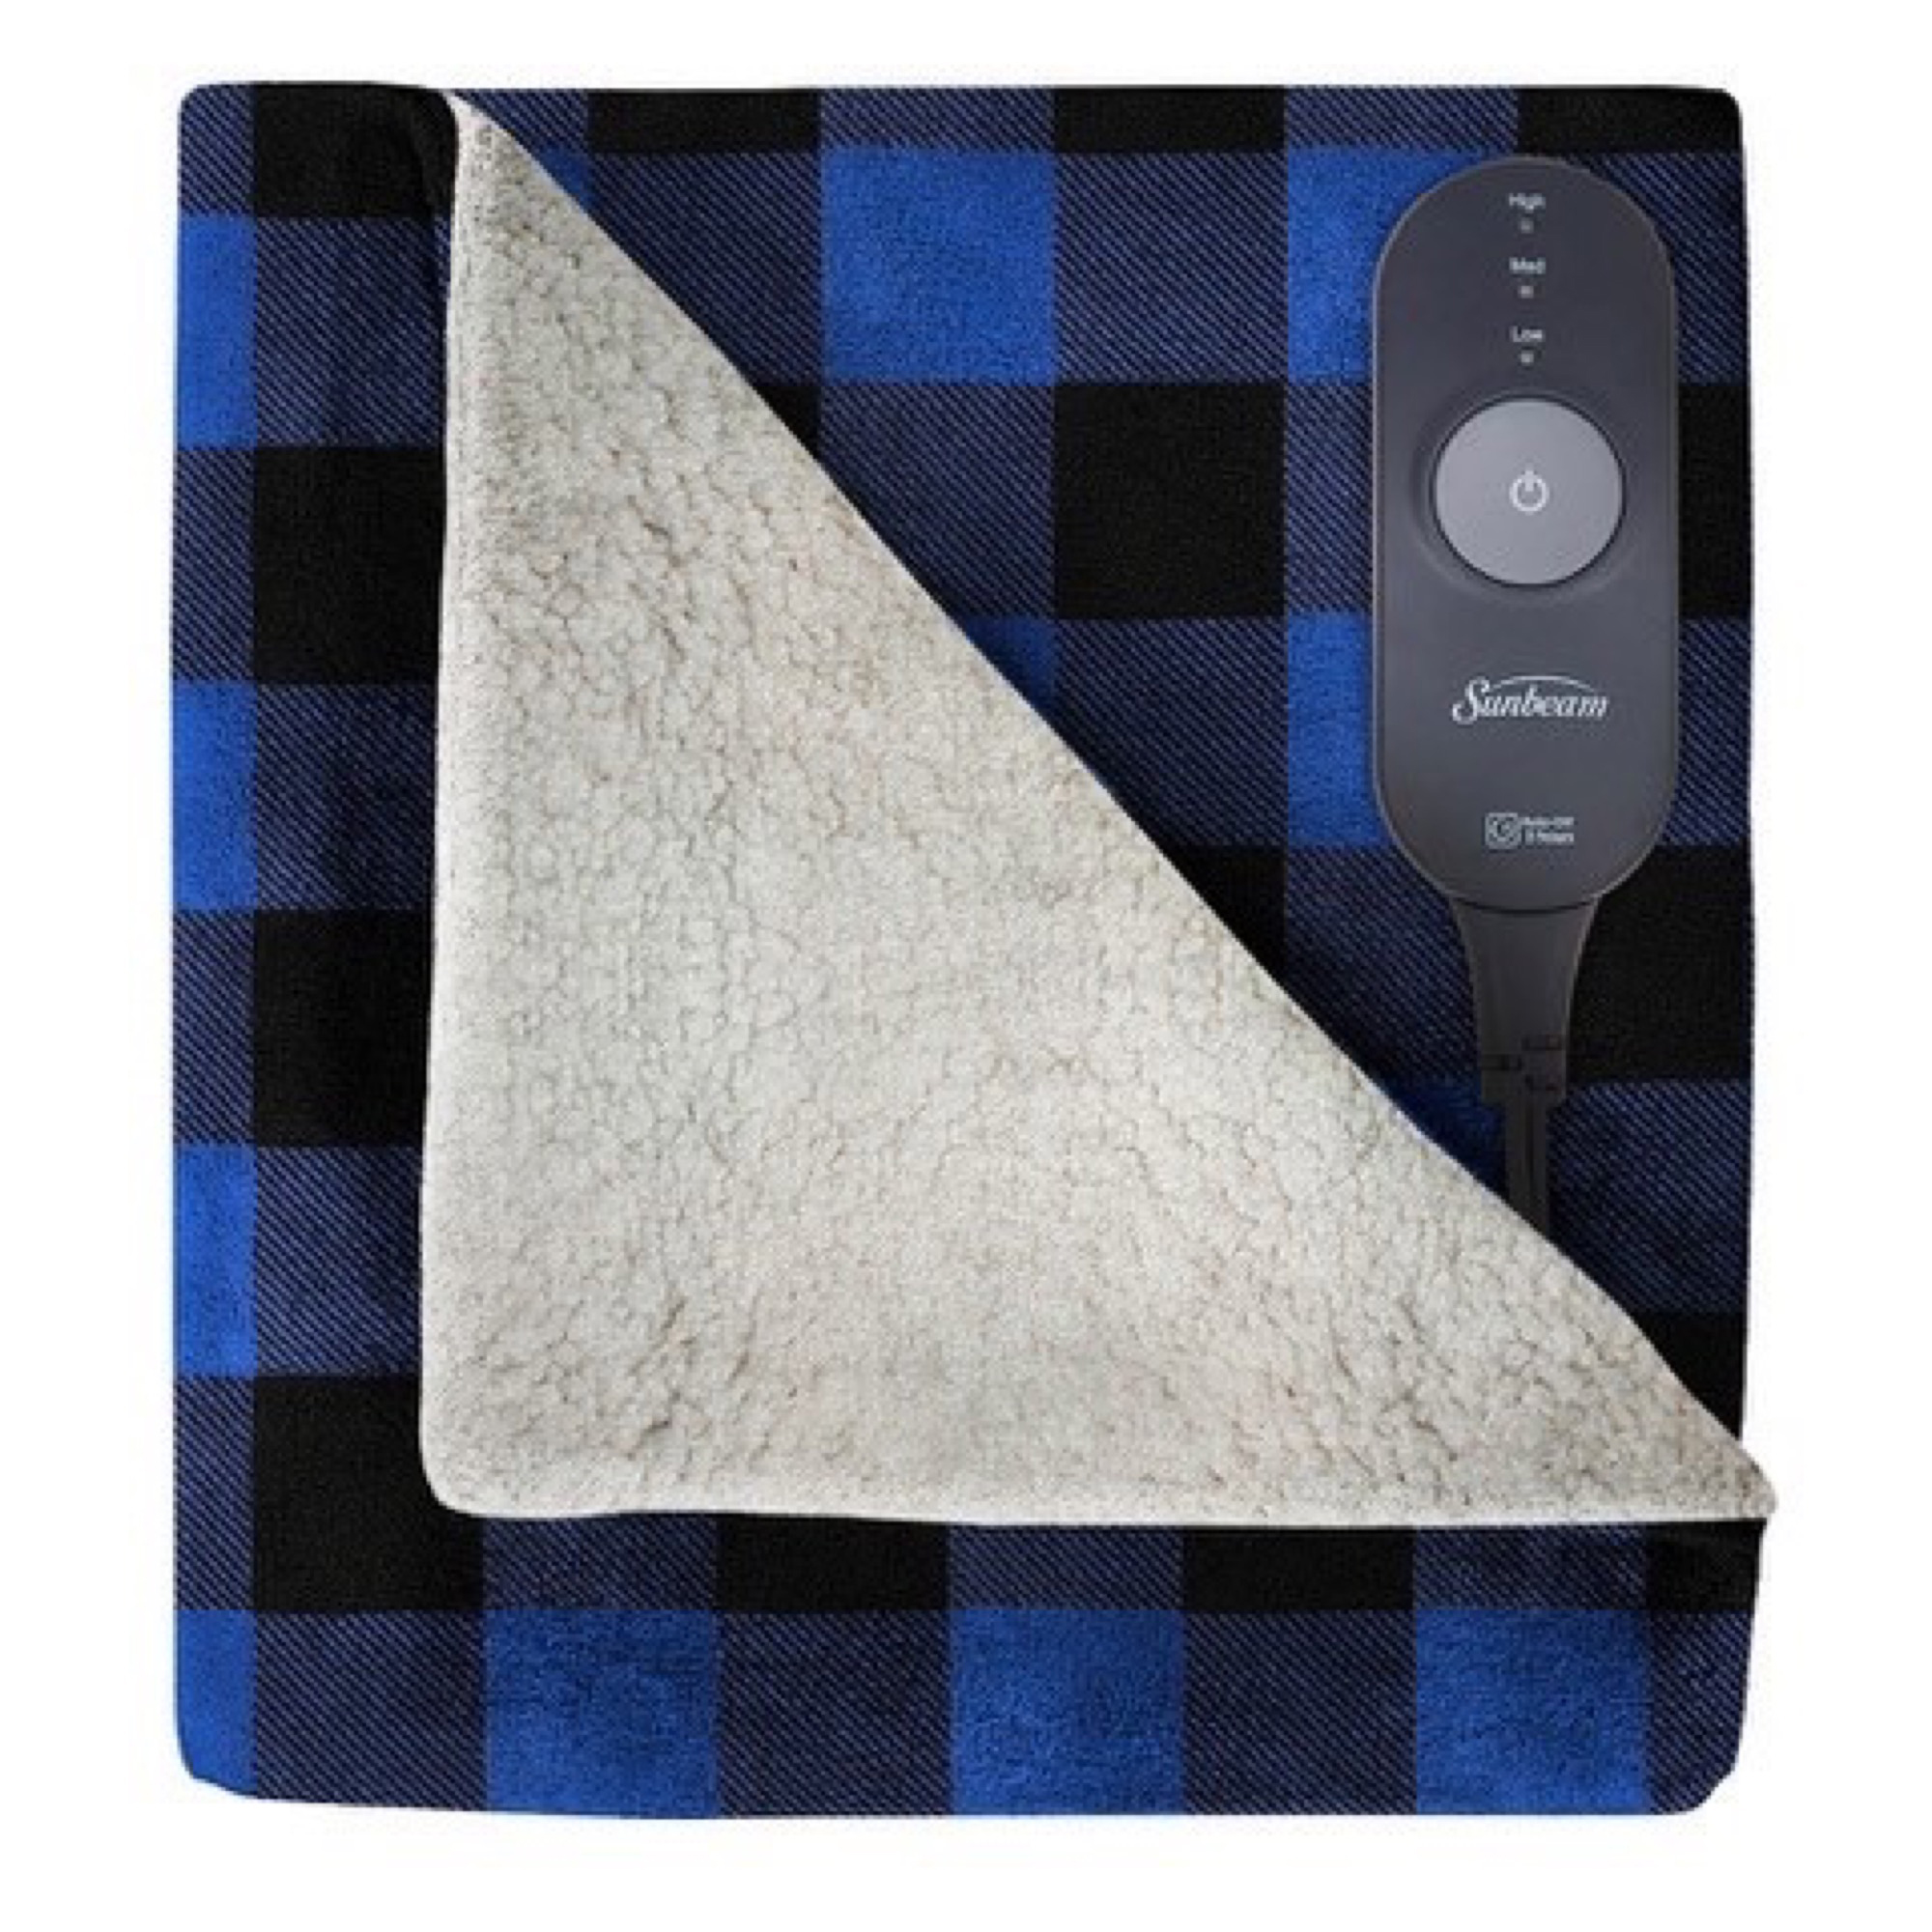 Sunbeam Electric Heated Microplush/Sherpa Throw Blanket